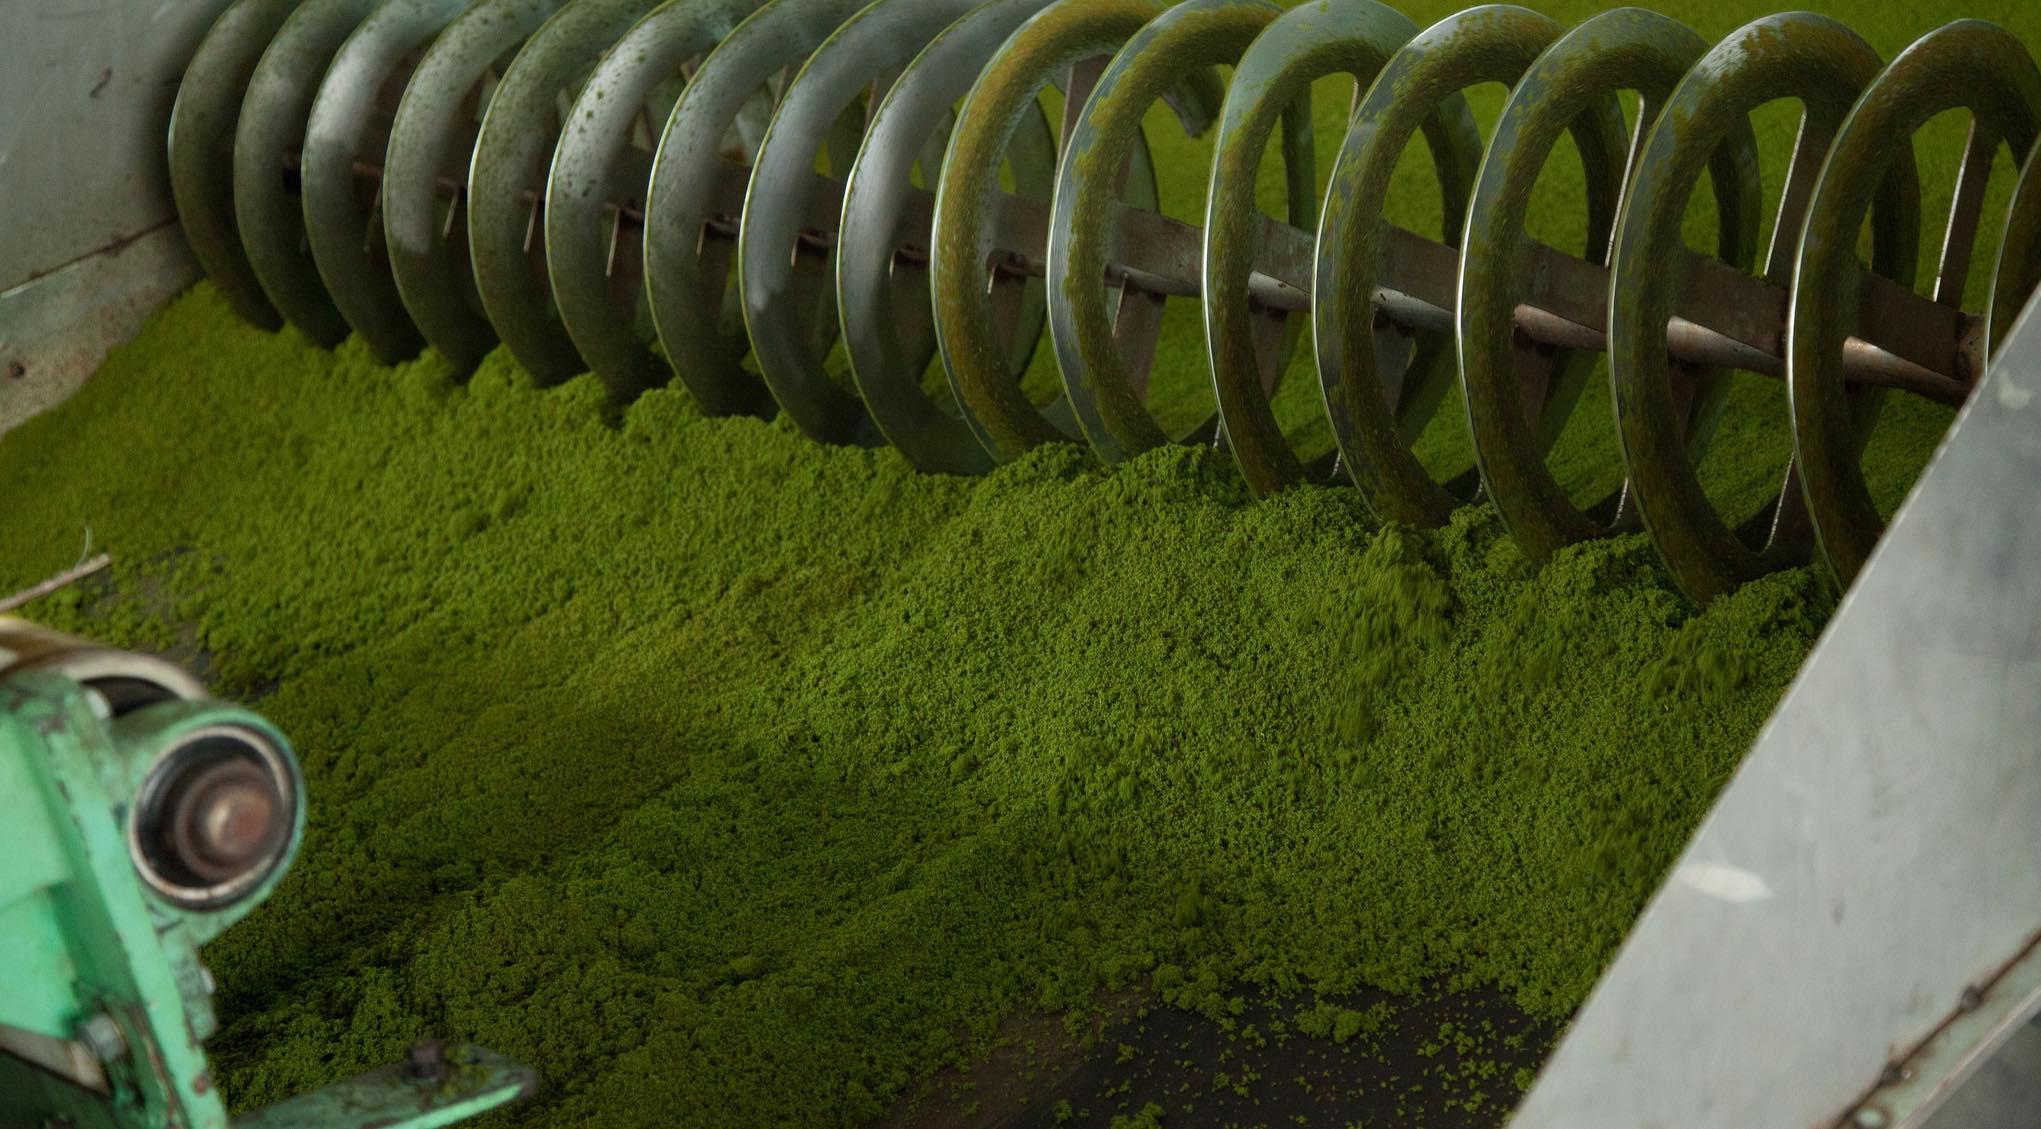 Tea processing in Rwanda (Photo: World Bank/Flickr)